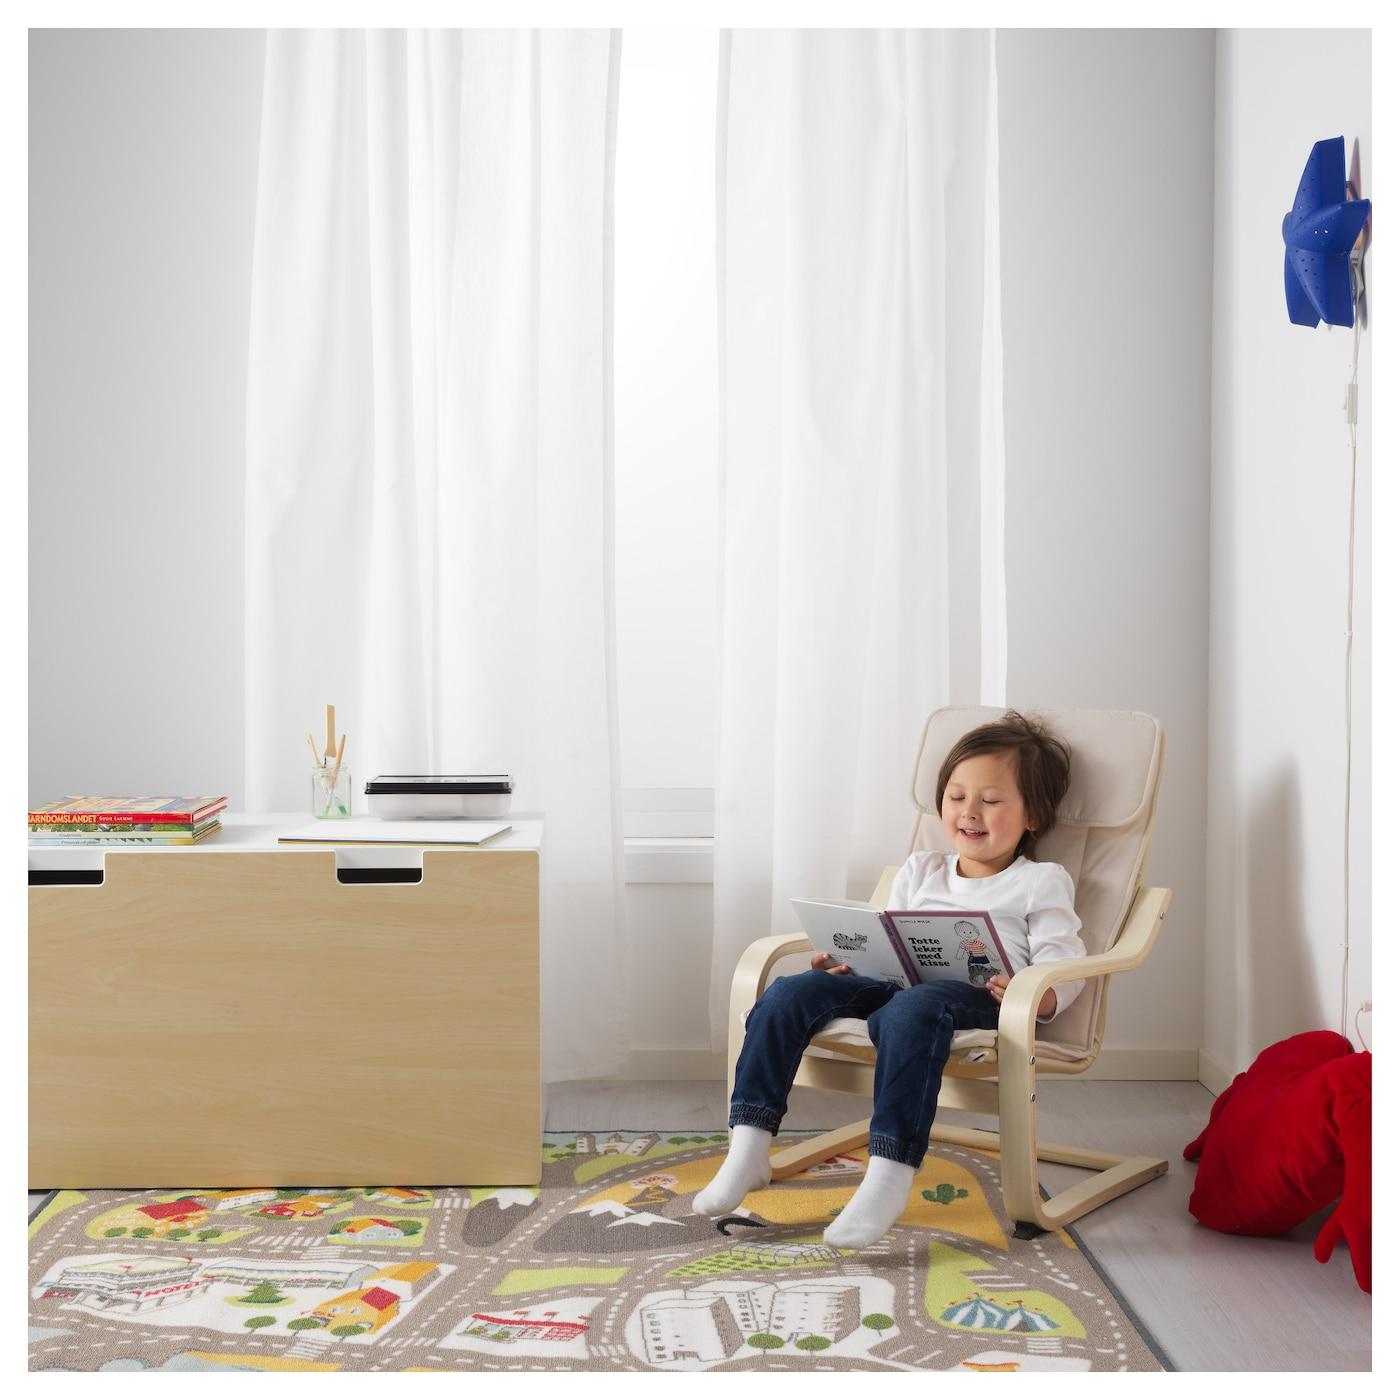 po ng kinderfauteuil berkenfineer alm s naturel ikea. Black Bedroom Furniture Sets. Home Design Ideas